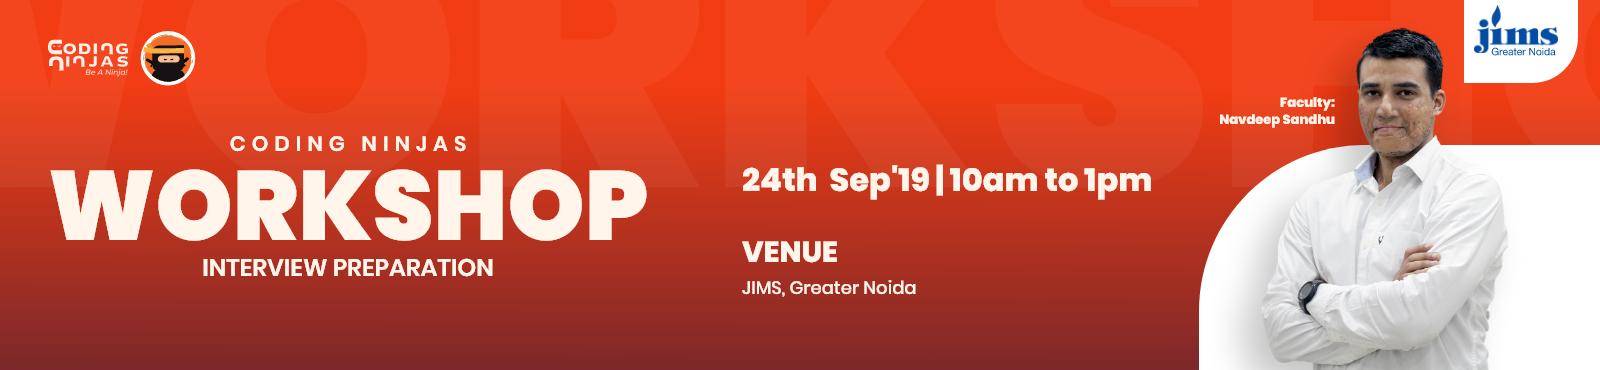 Workshop at JIMS, Greater Noida